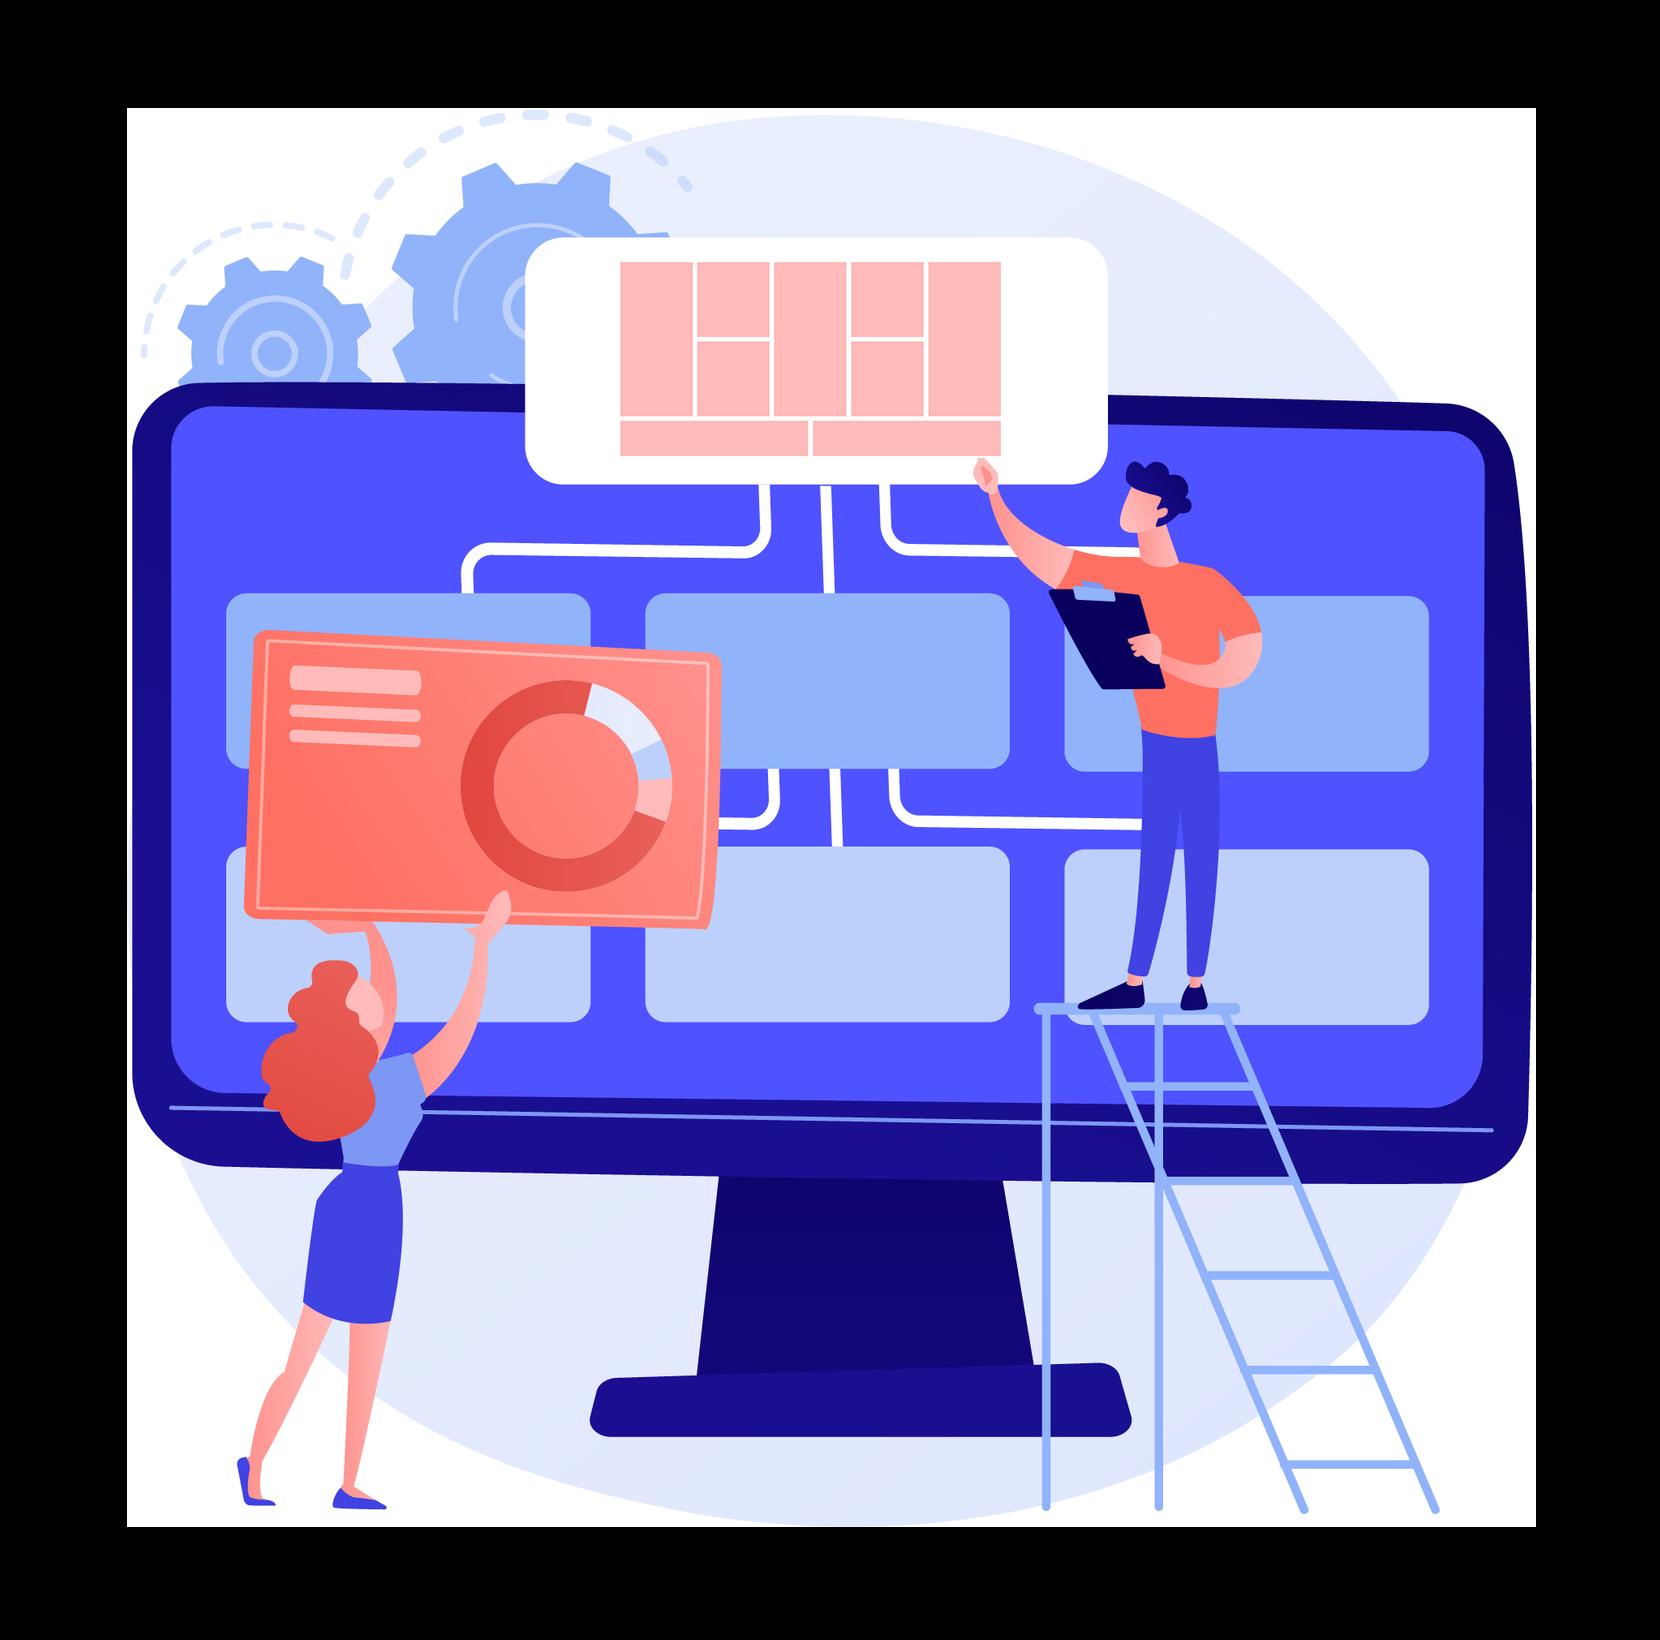 Advanced business canvas development illustration